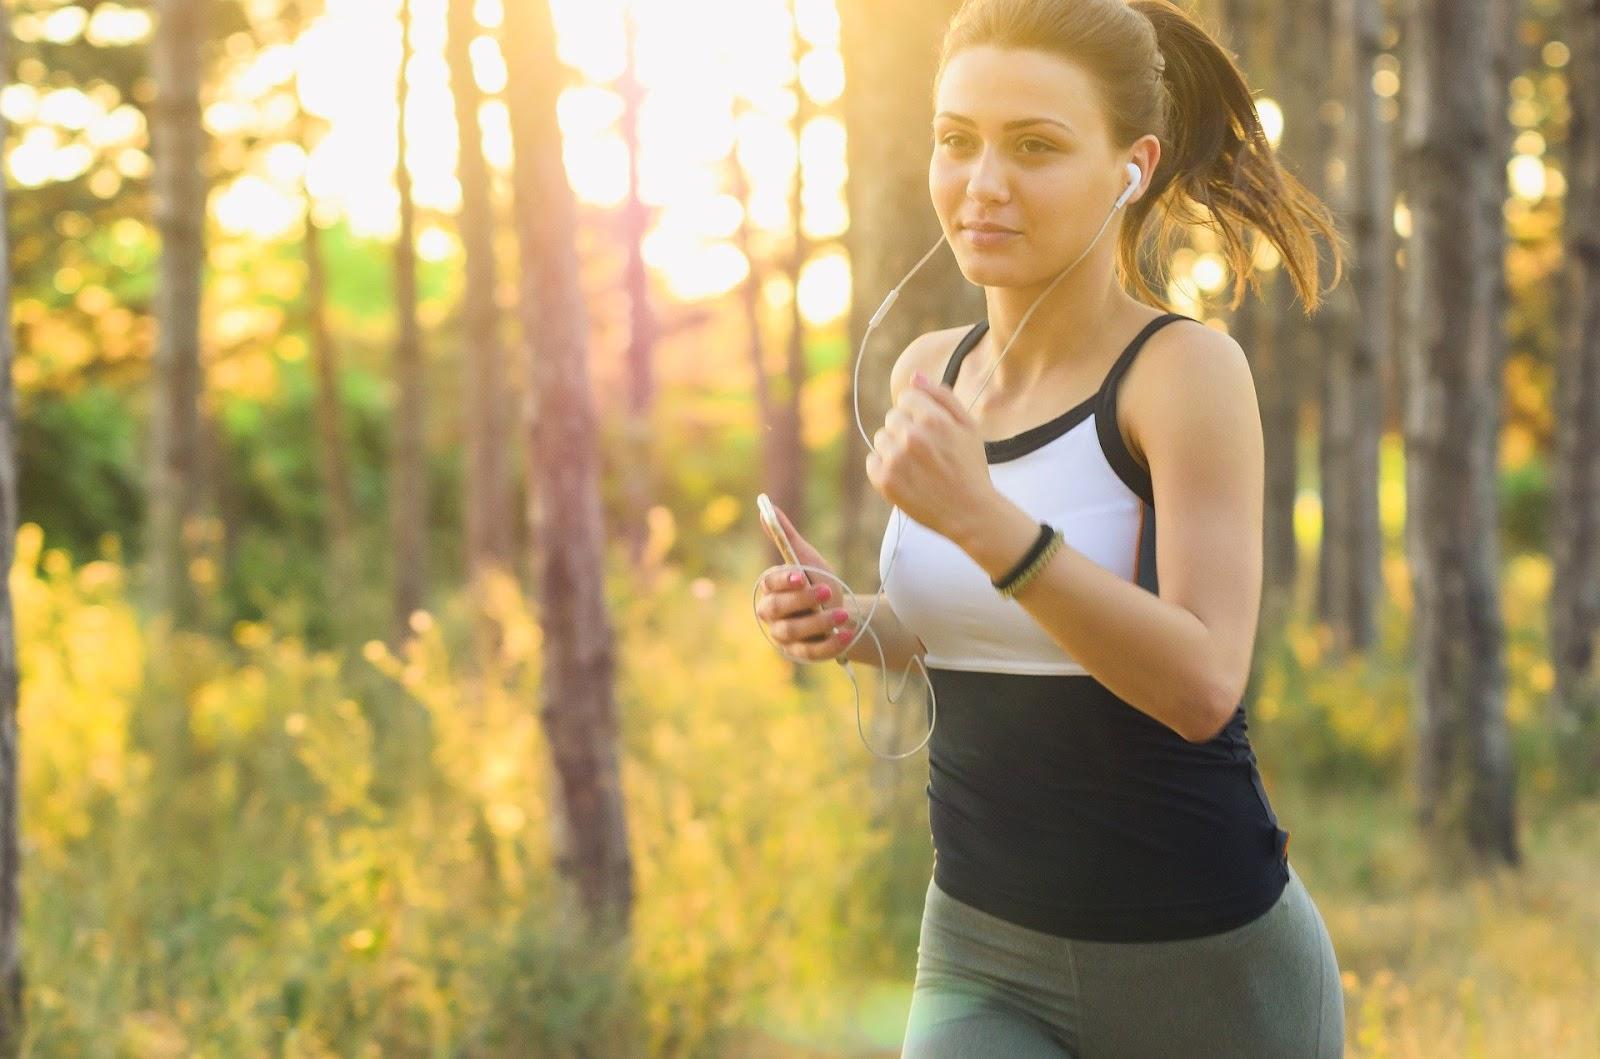 4 Running Essentials Every Beginner Needs